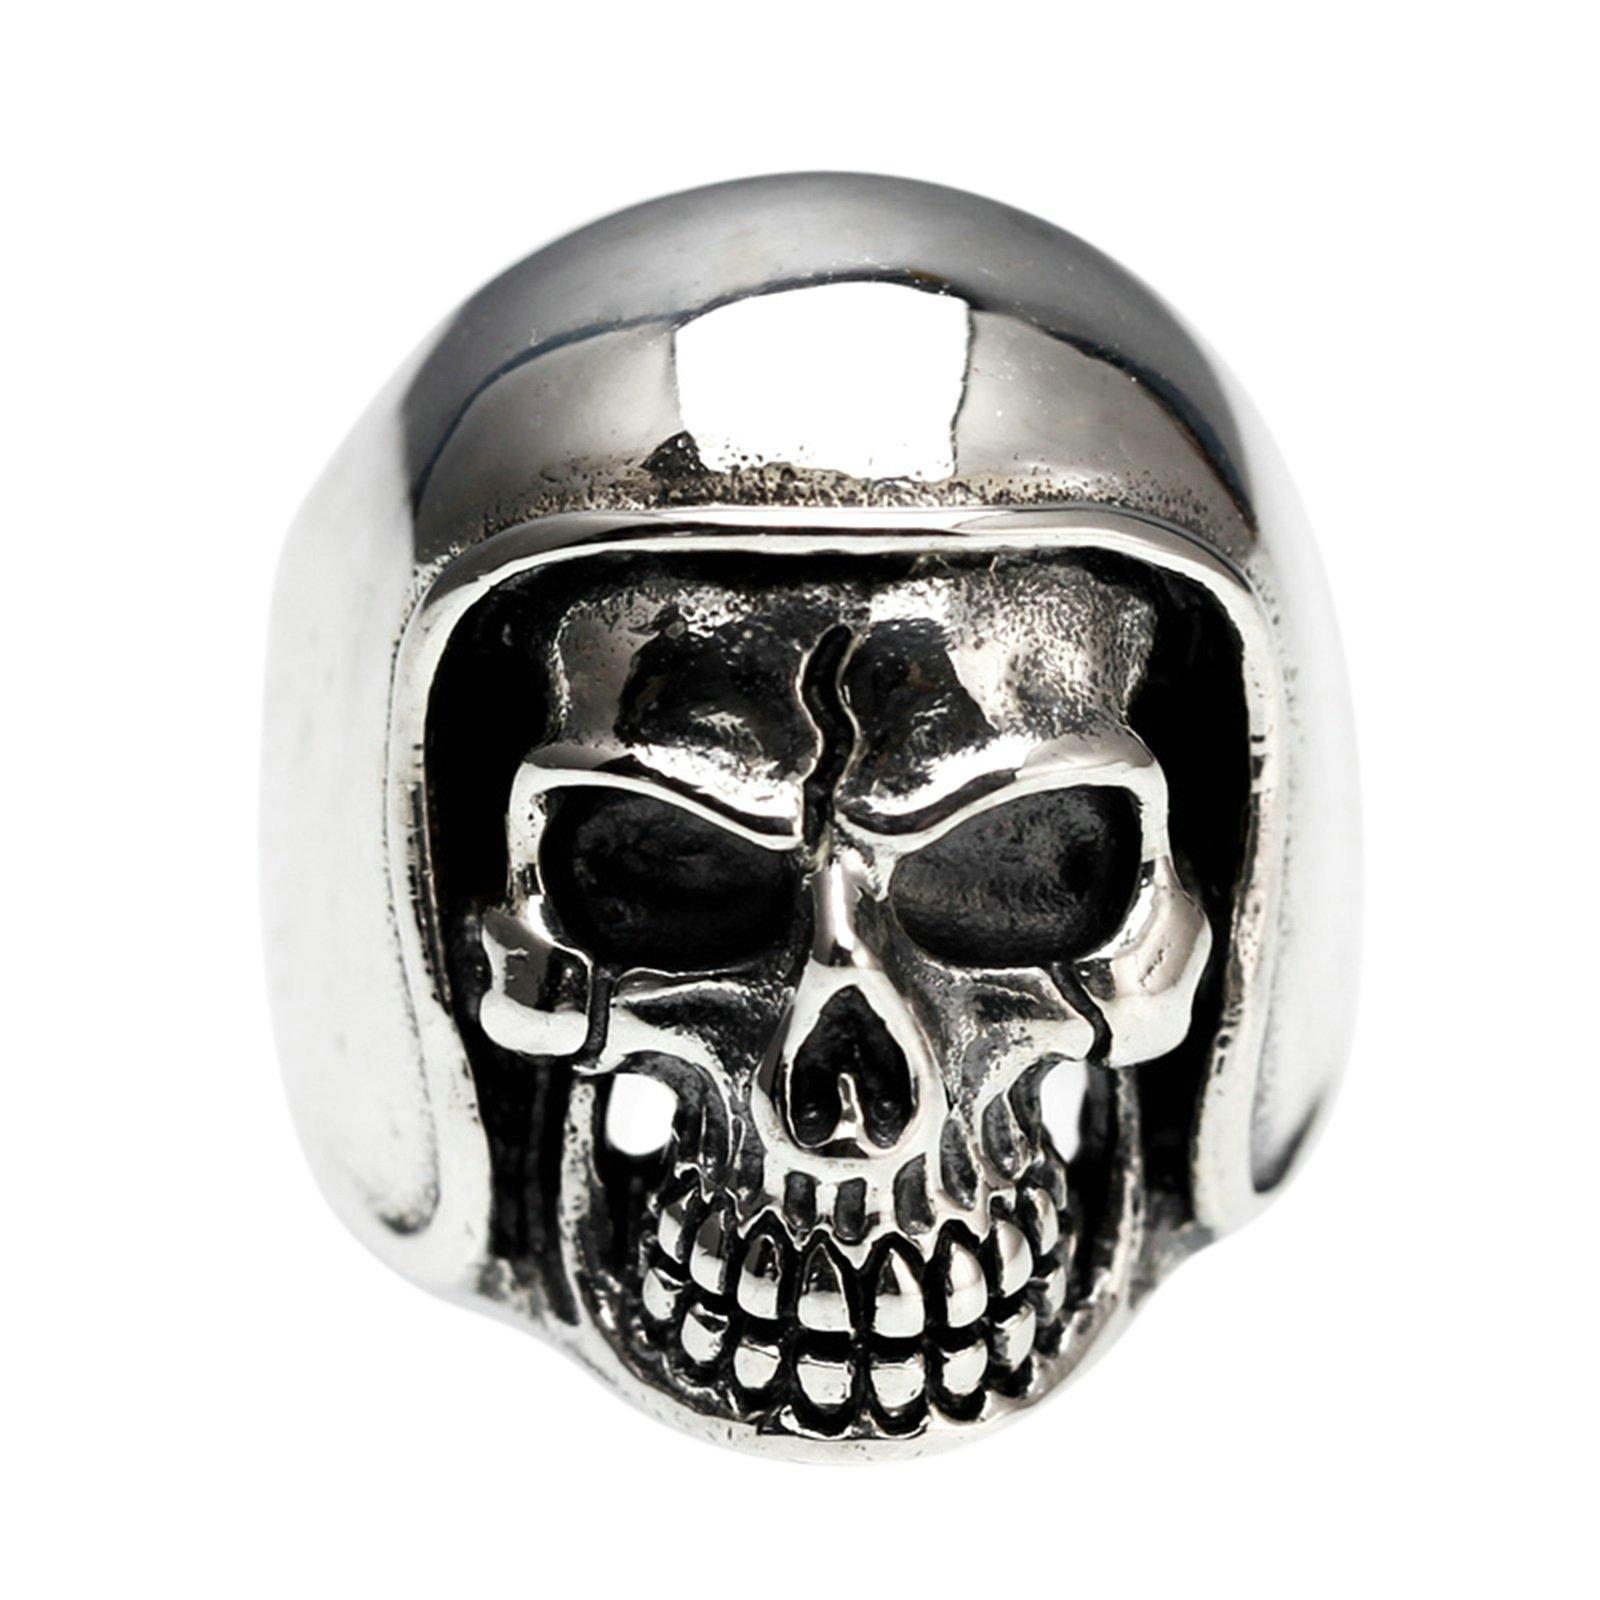 Adisaer Biker Rings Silver Ring for Men Motorcycle Helmet Skull Ring Size 11 Vintage Punk Jewelry